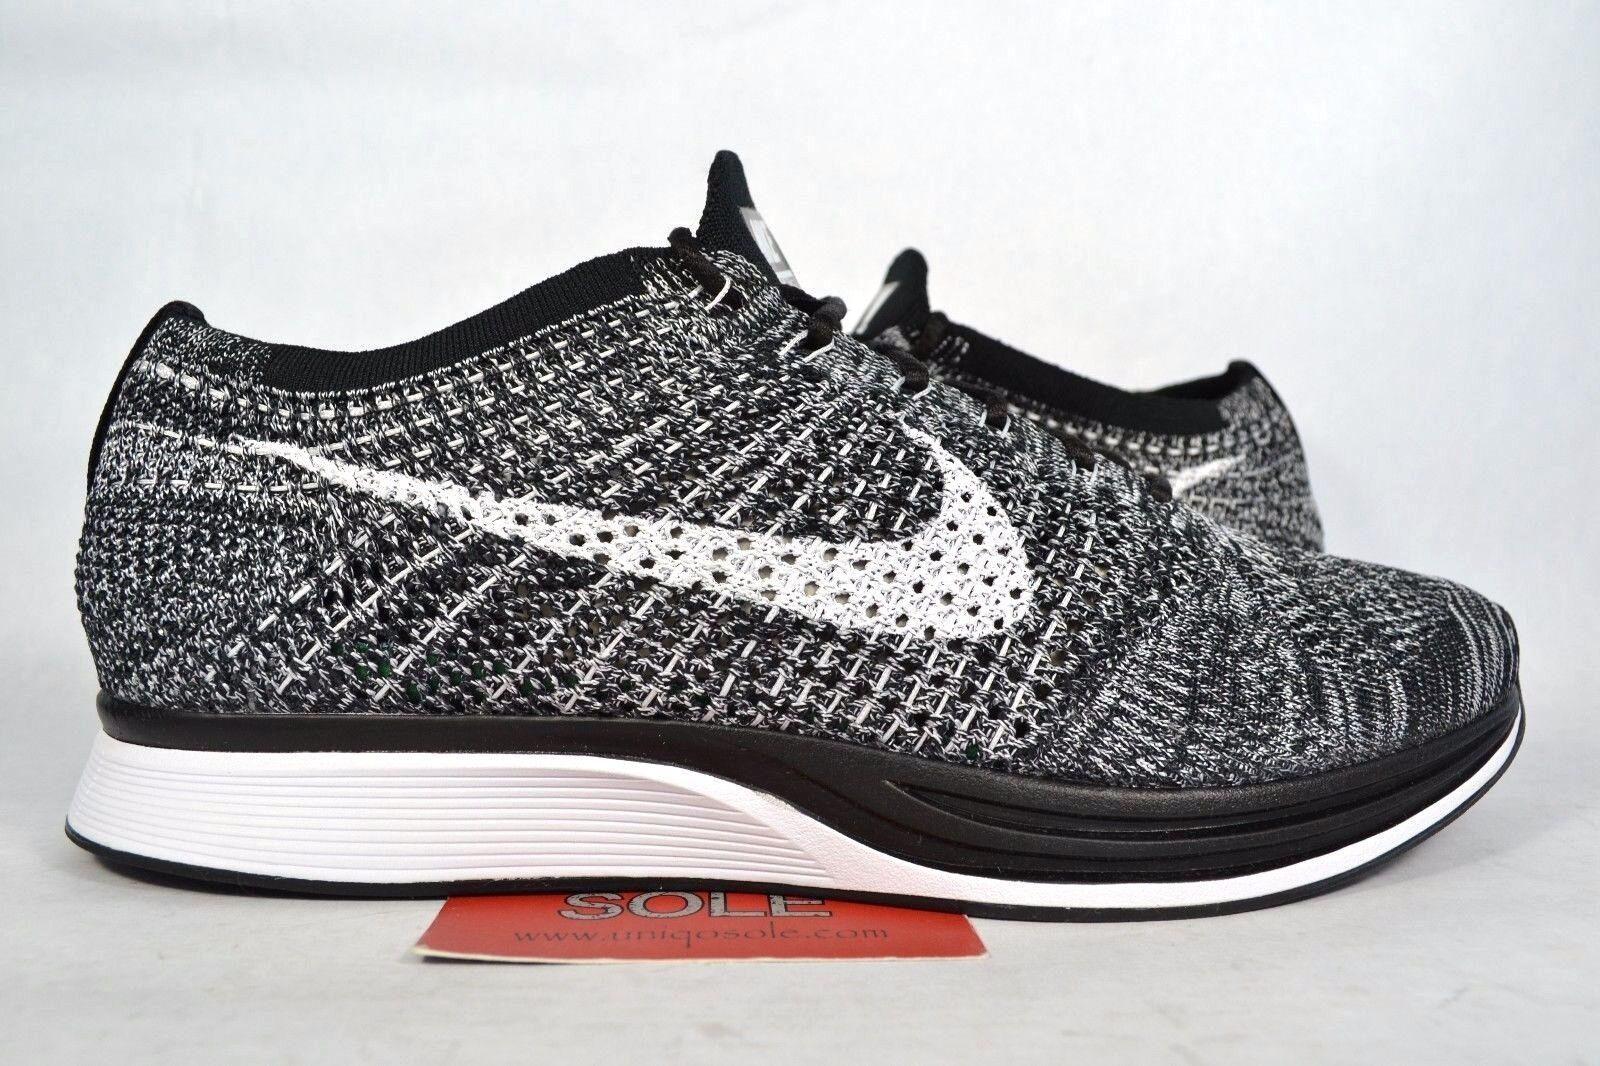 Nike Flyknit Racer OREO 2.0 noir blanc COOKIES & CREAM 526628-012 sz 9 Femme